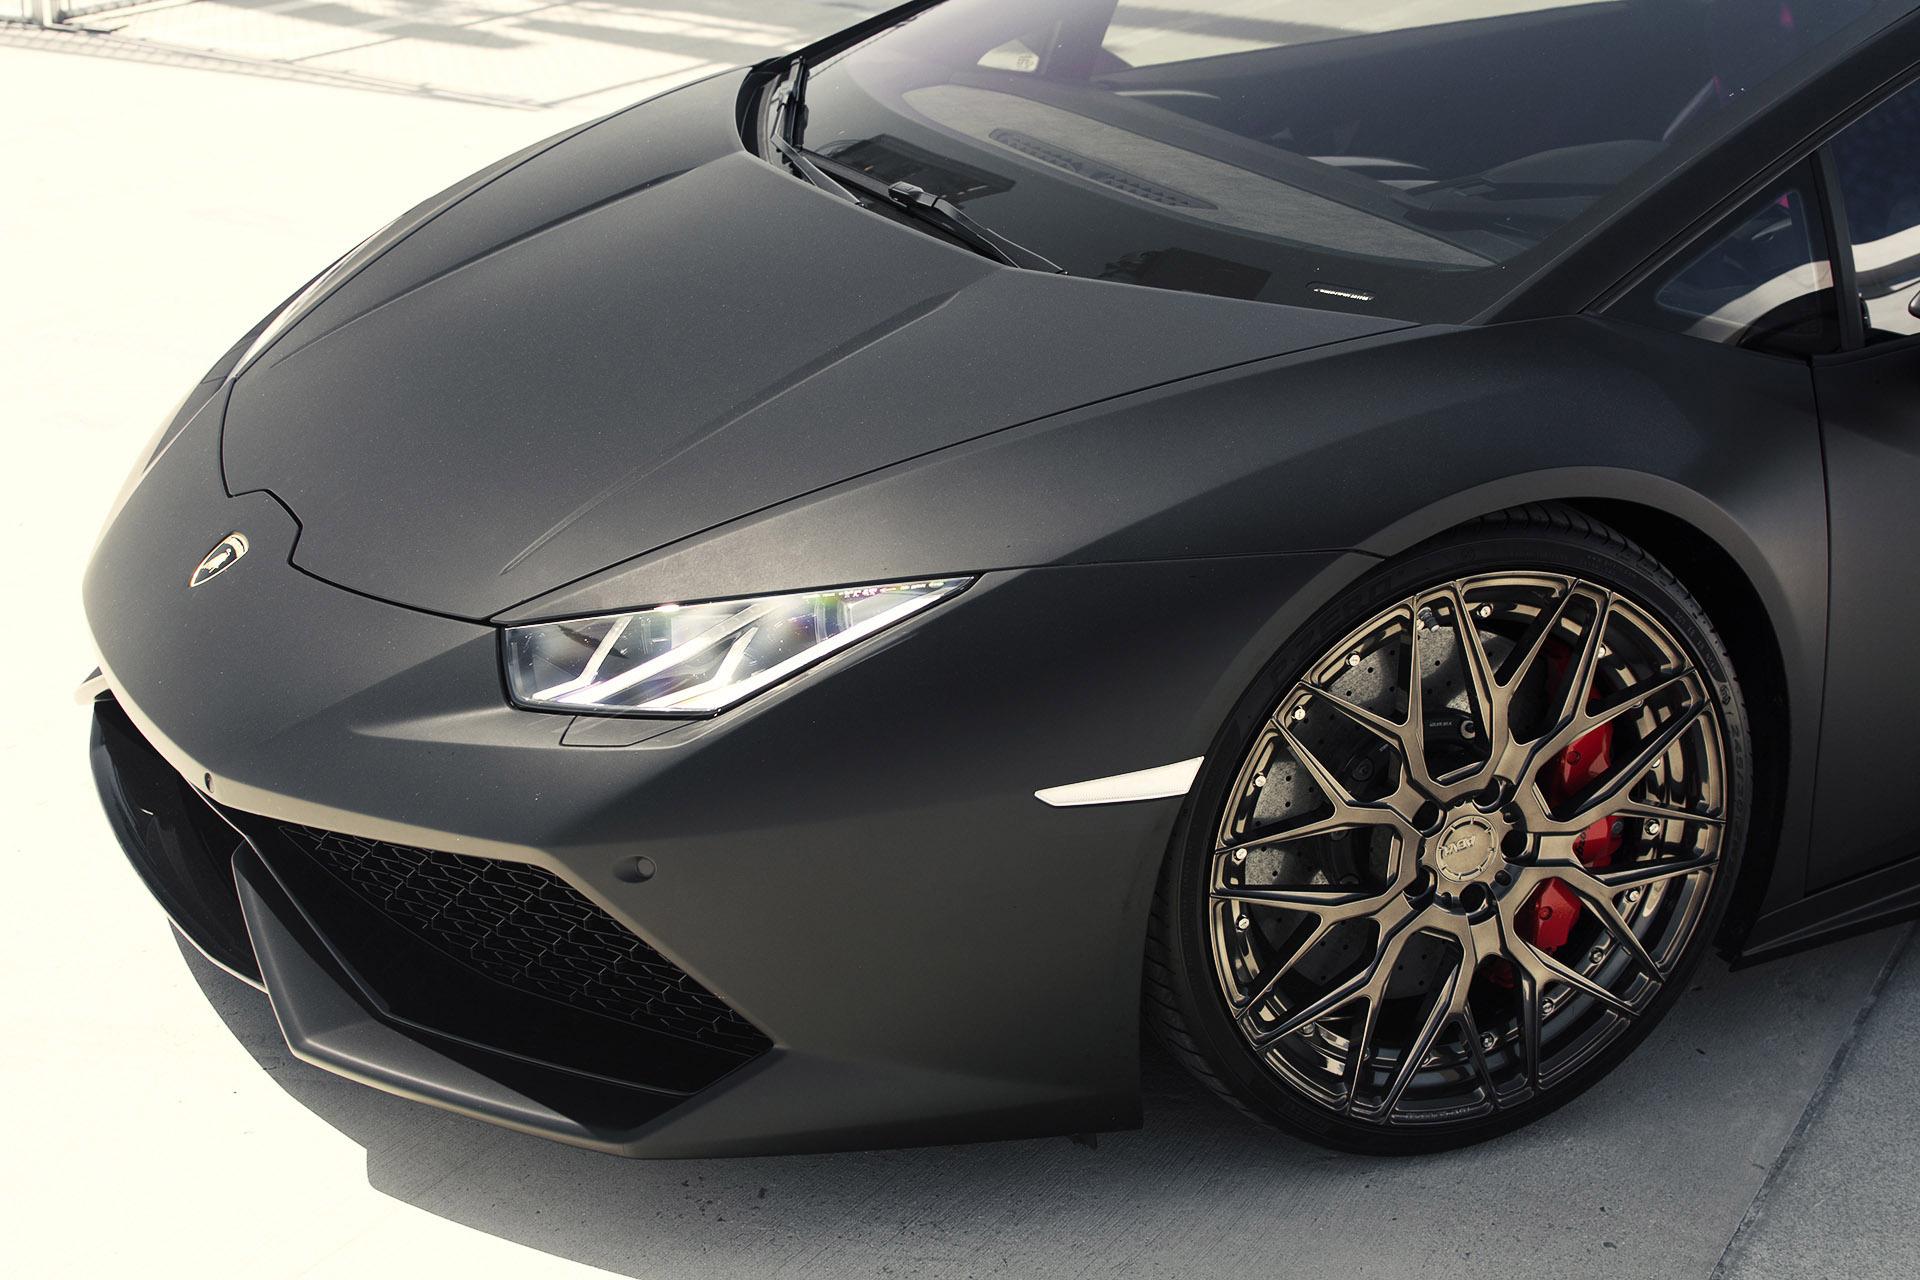 2015 BMW F83 M4 Convertible · 2015 GMG Lamborghini Huracan